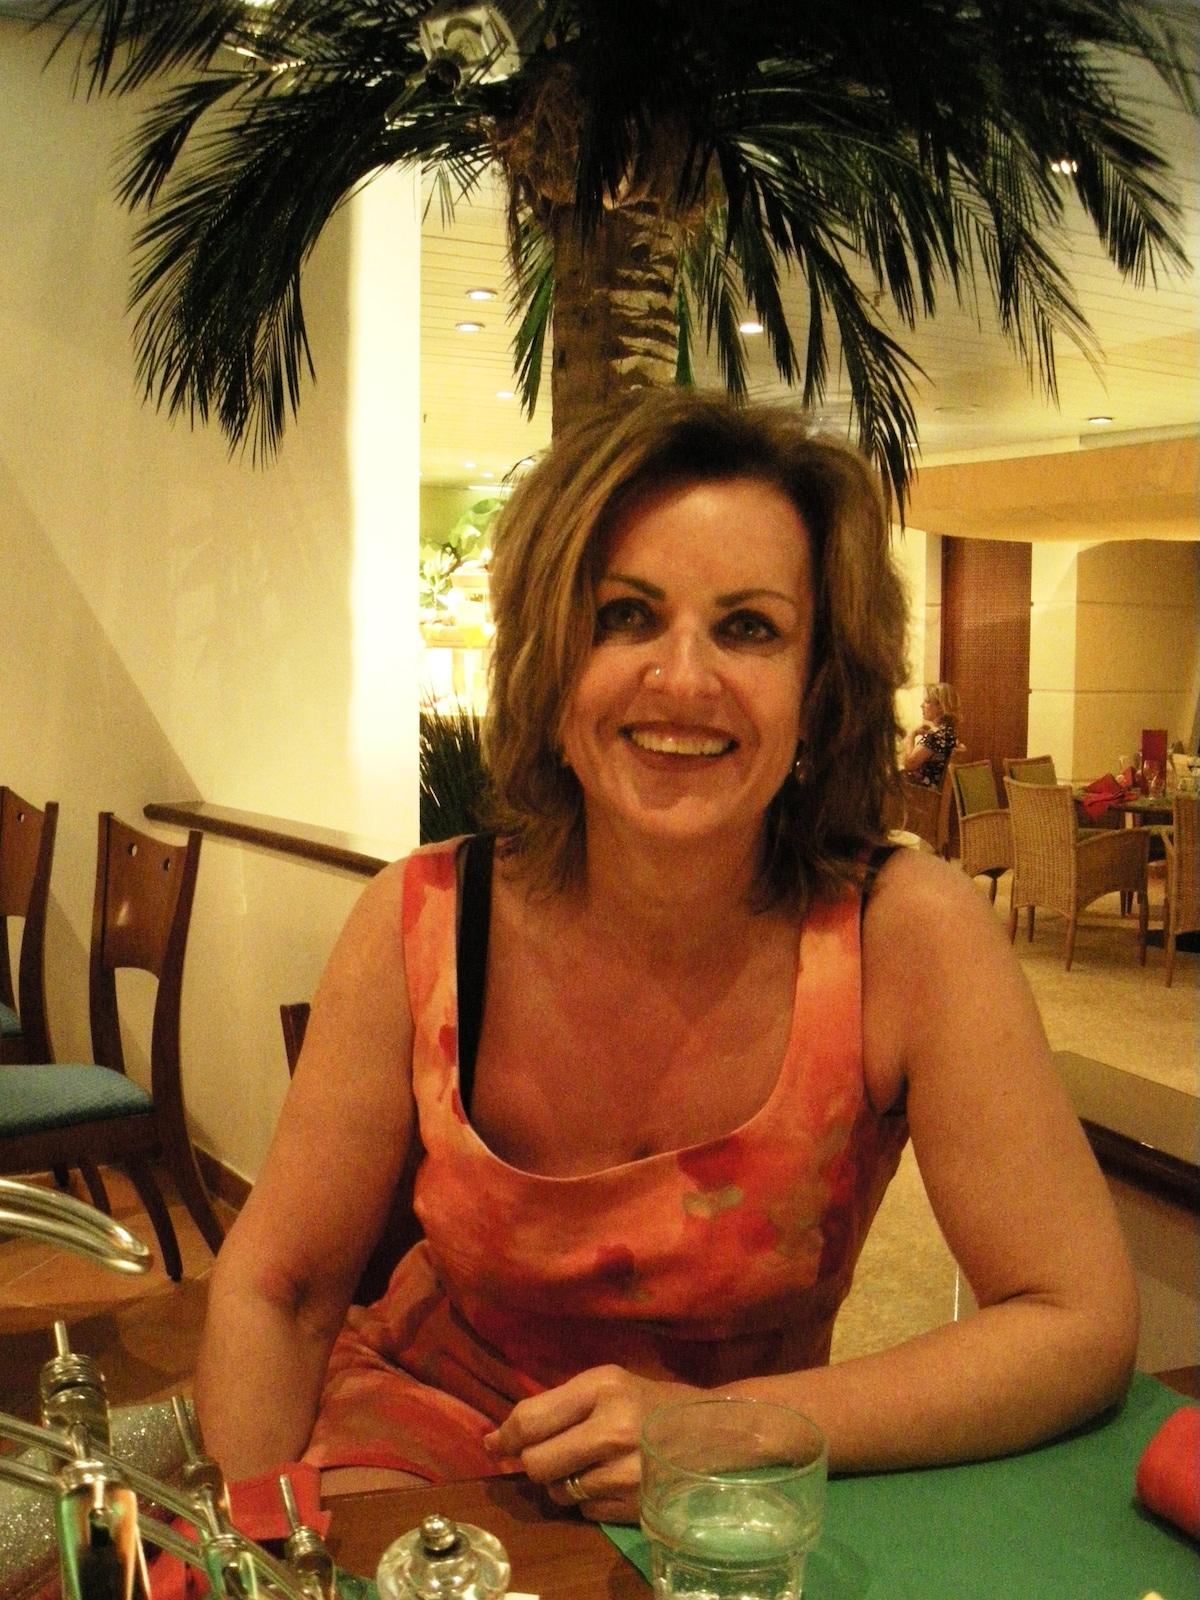 Gina from Bad Krozingen